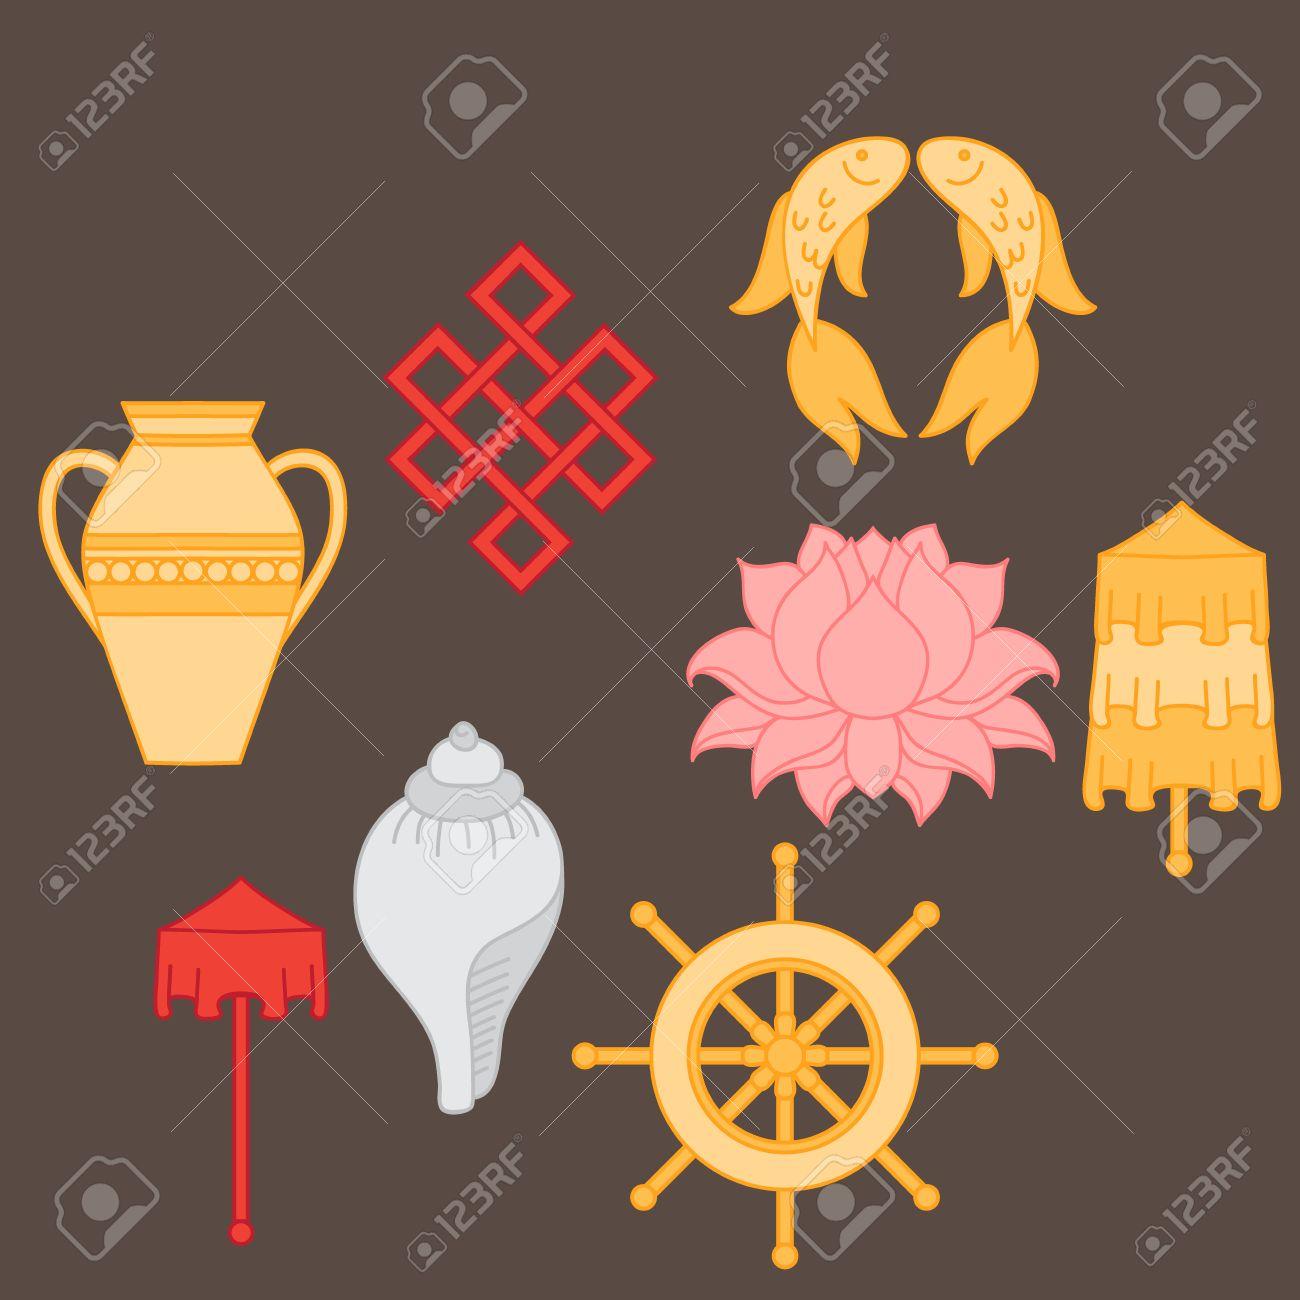 Buddhist symbolism the 8 auspicious symbols of buddhism right buddhist symbolism the 8 auspicious symbols of buddhism right coiled white conch biocorpaavc Gallery